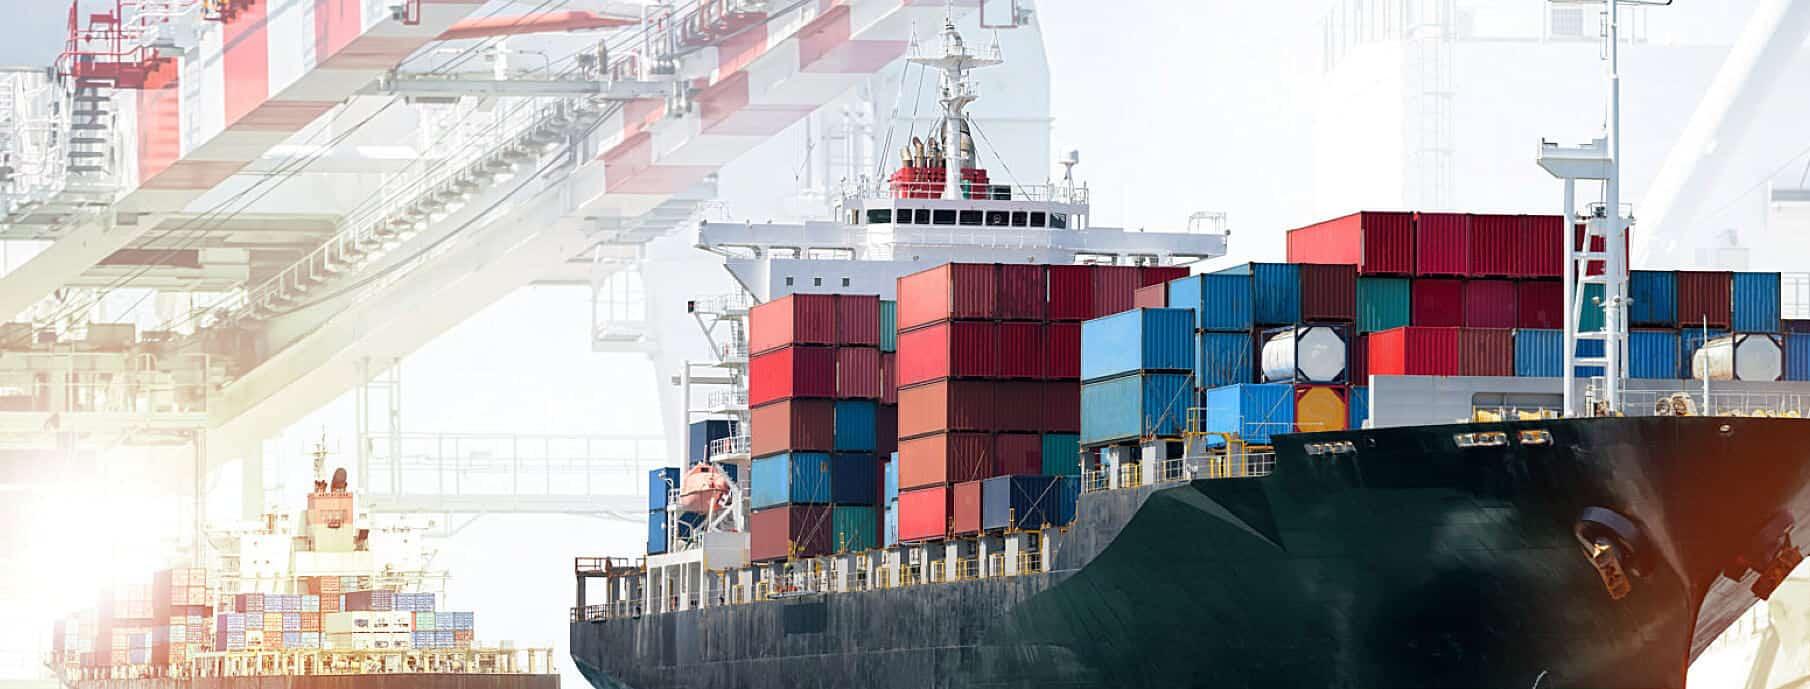 cargo ship on dock